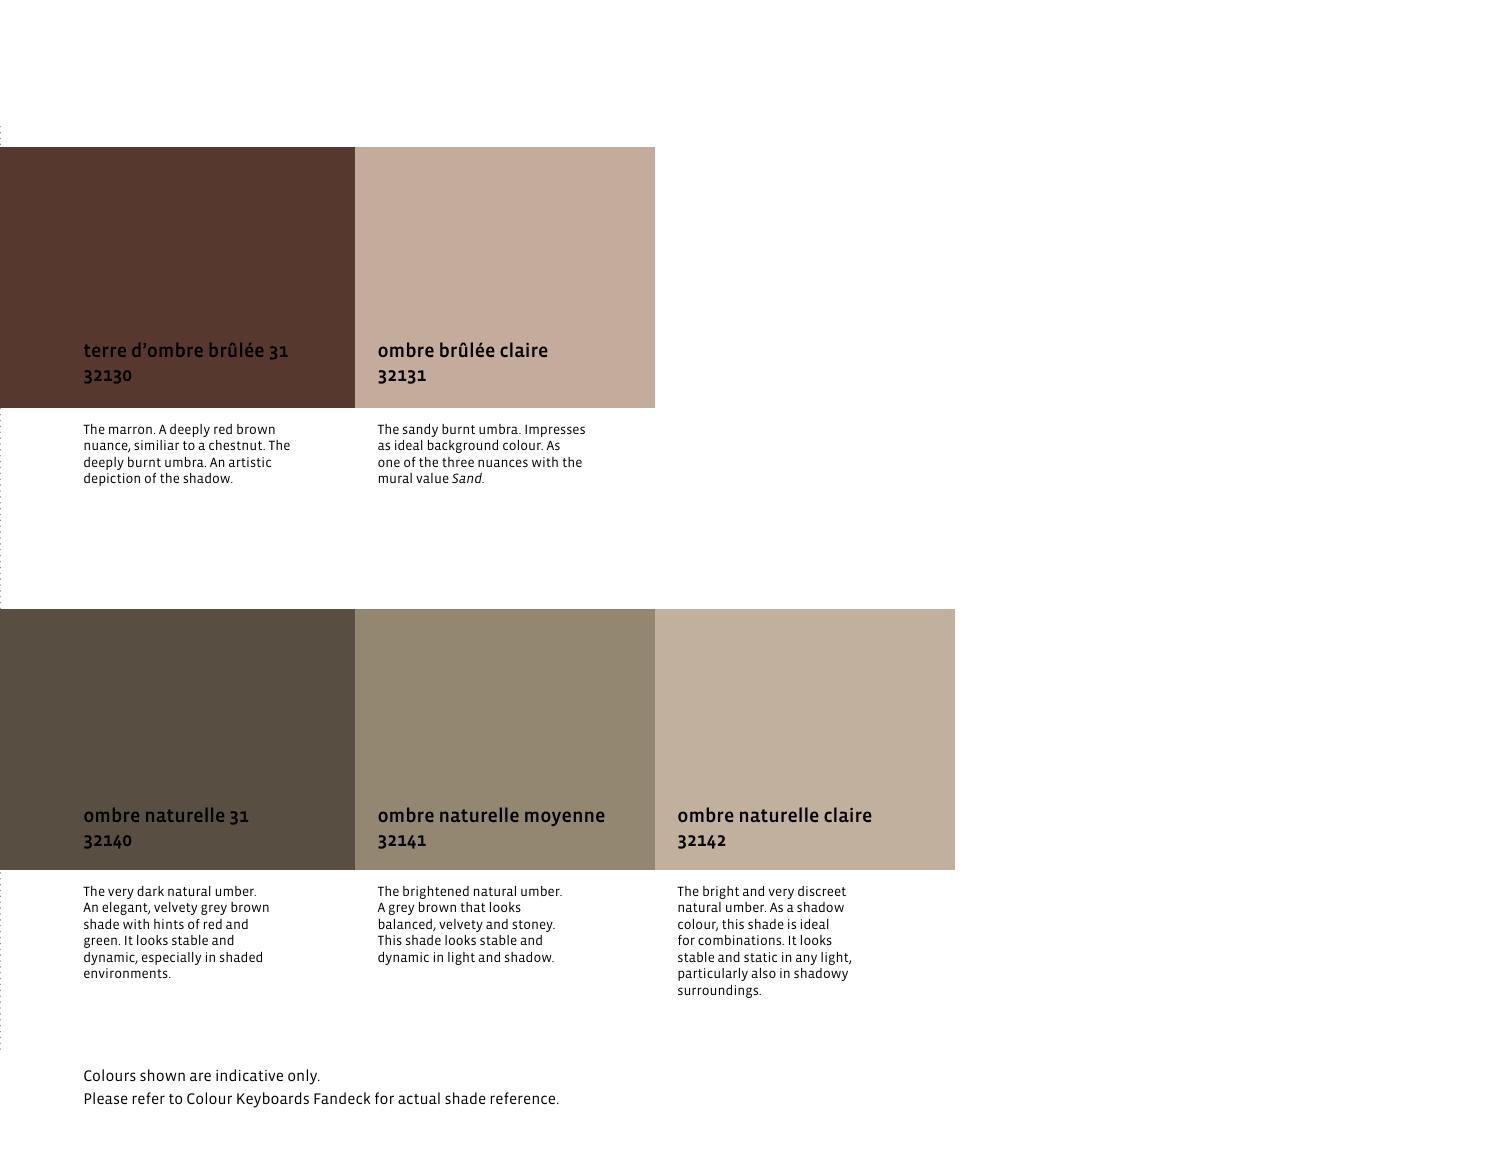 Umbra: natural color and its shades